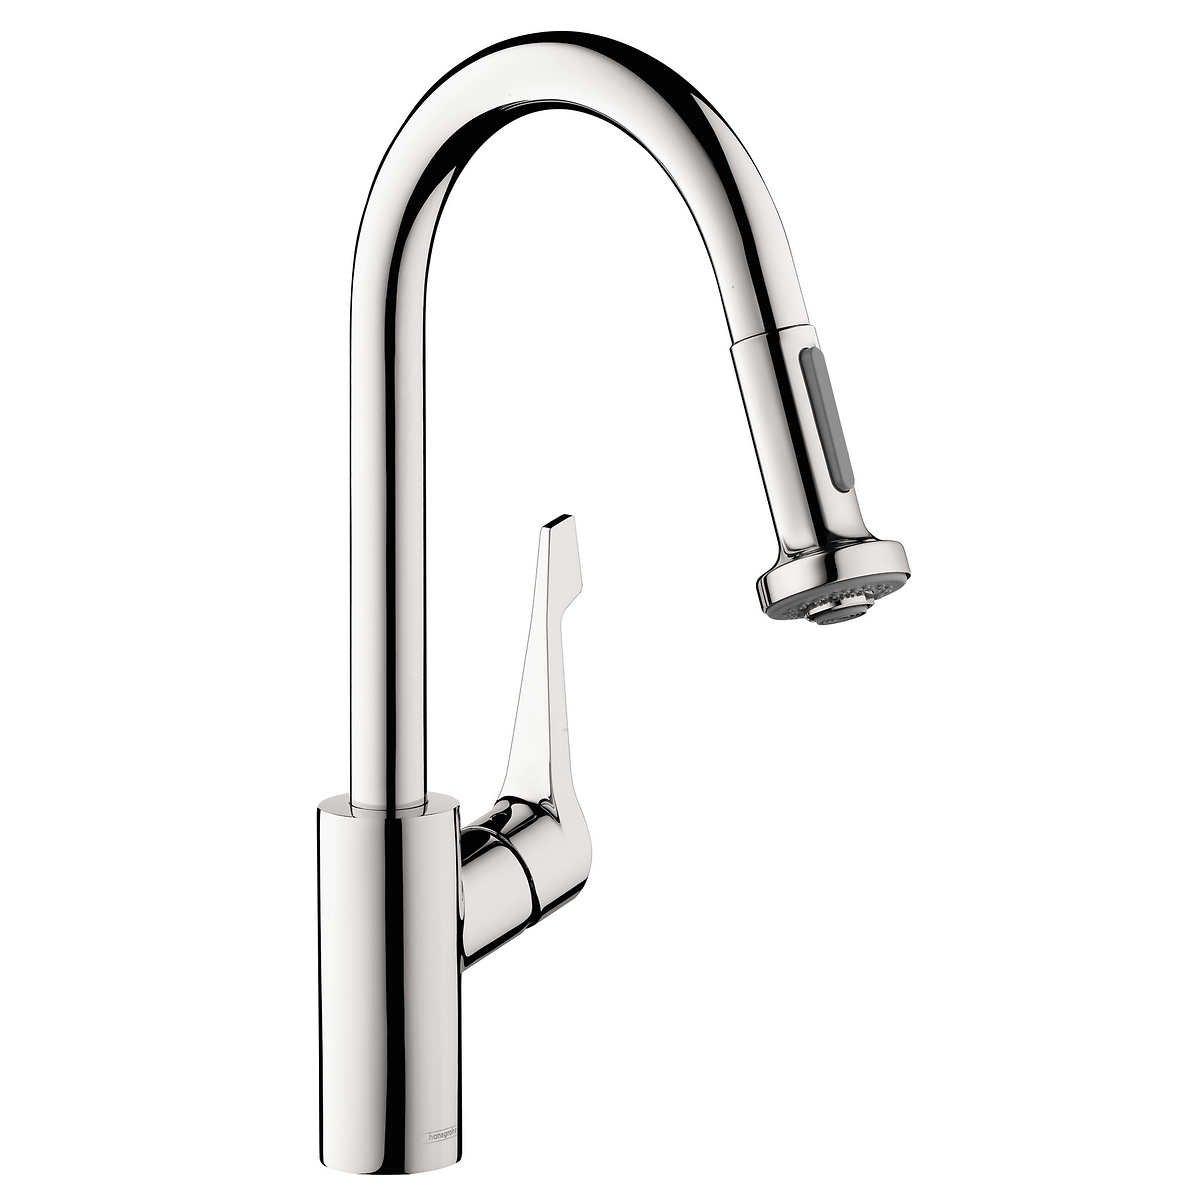 Hansgrohe cento classic kitchen faucet steel optik amazon com